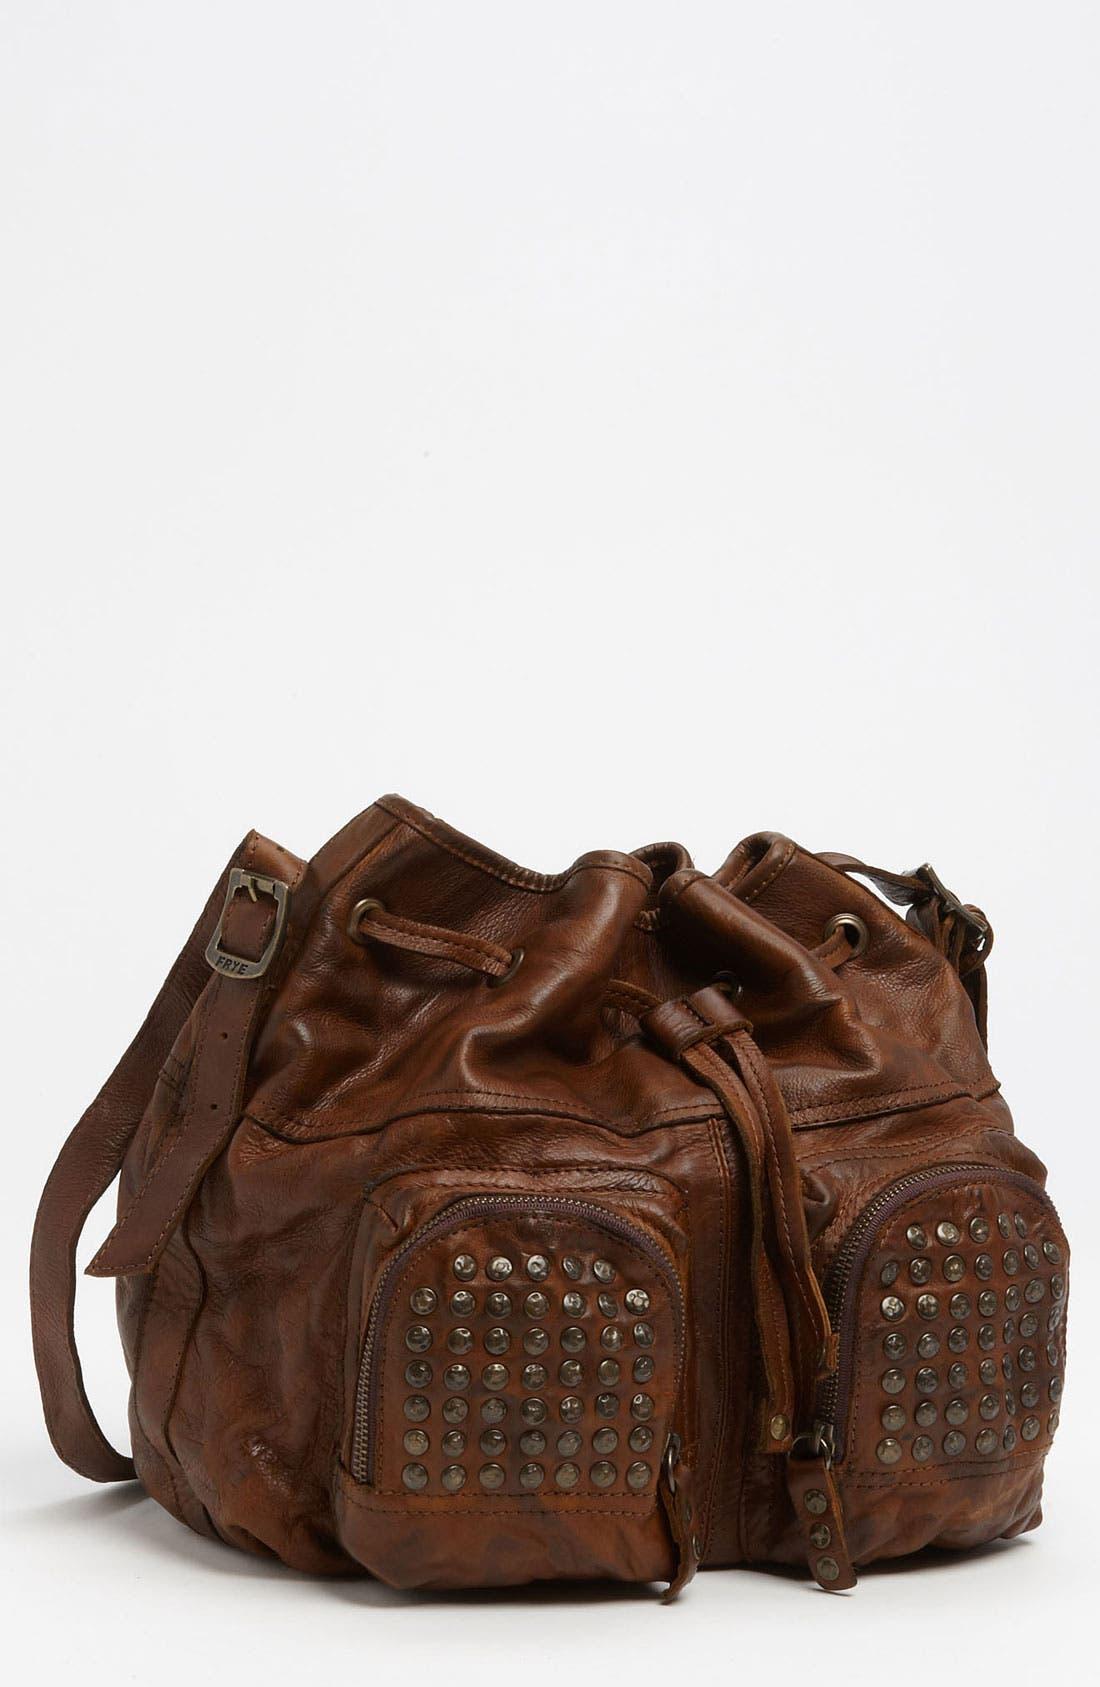 Alternate Image 1 Selected - Frye 'Brooke' Drawstring Shoulder Bag, Medium